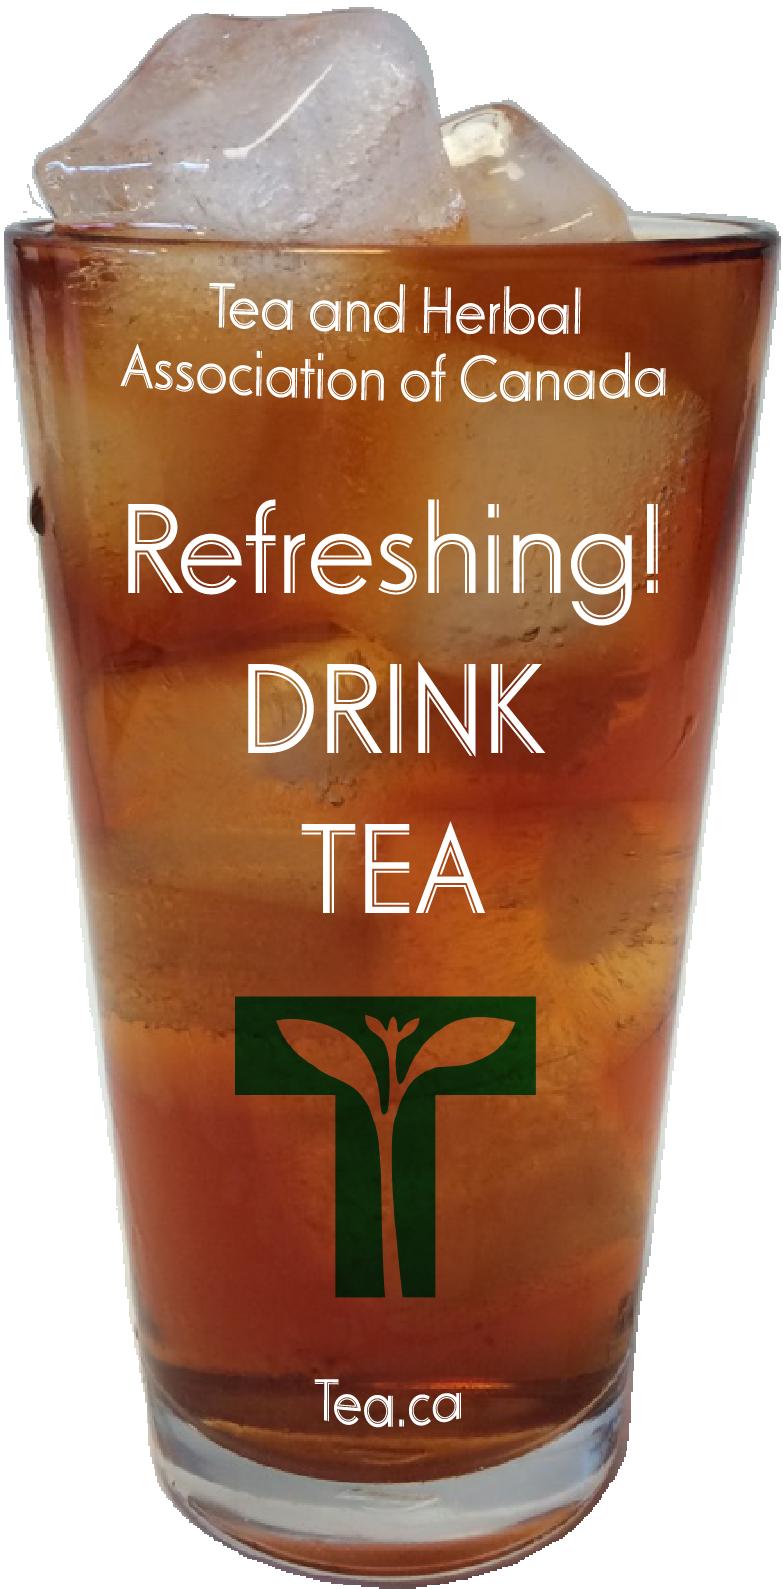 Refreshing! Drink Tea!